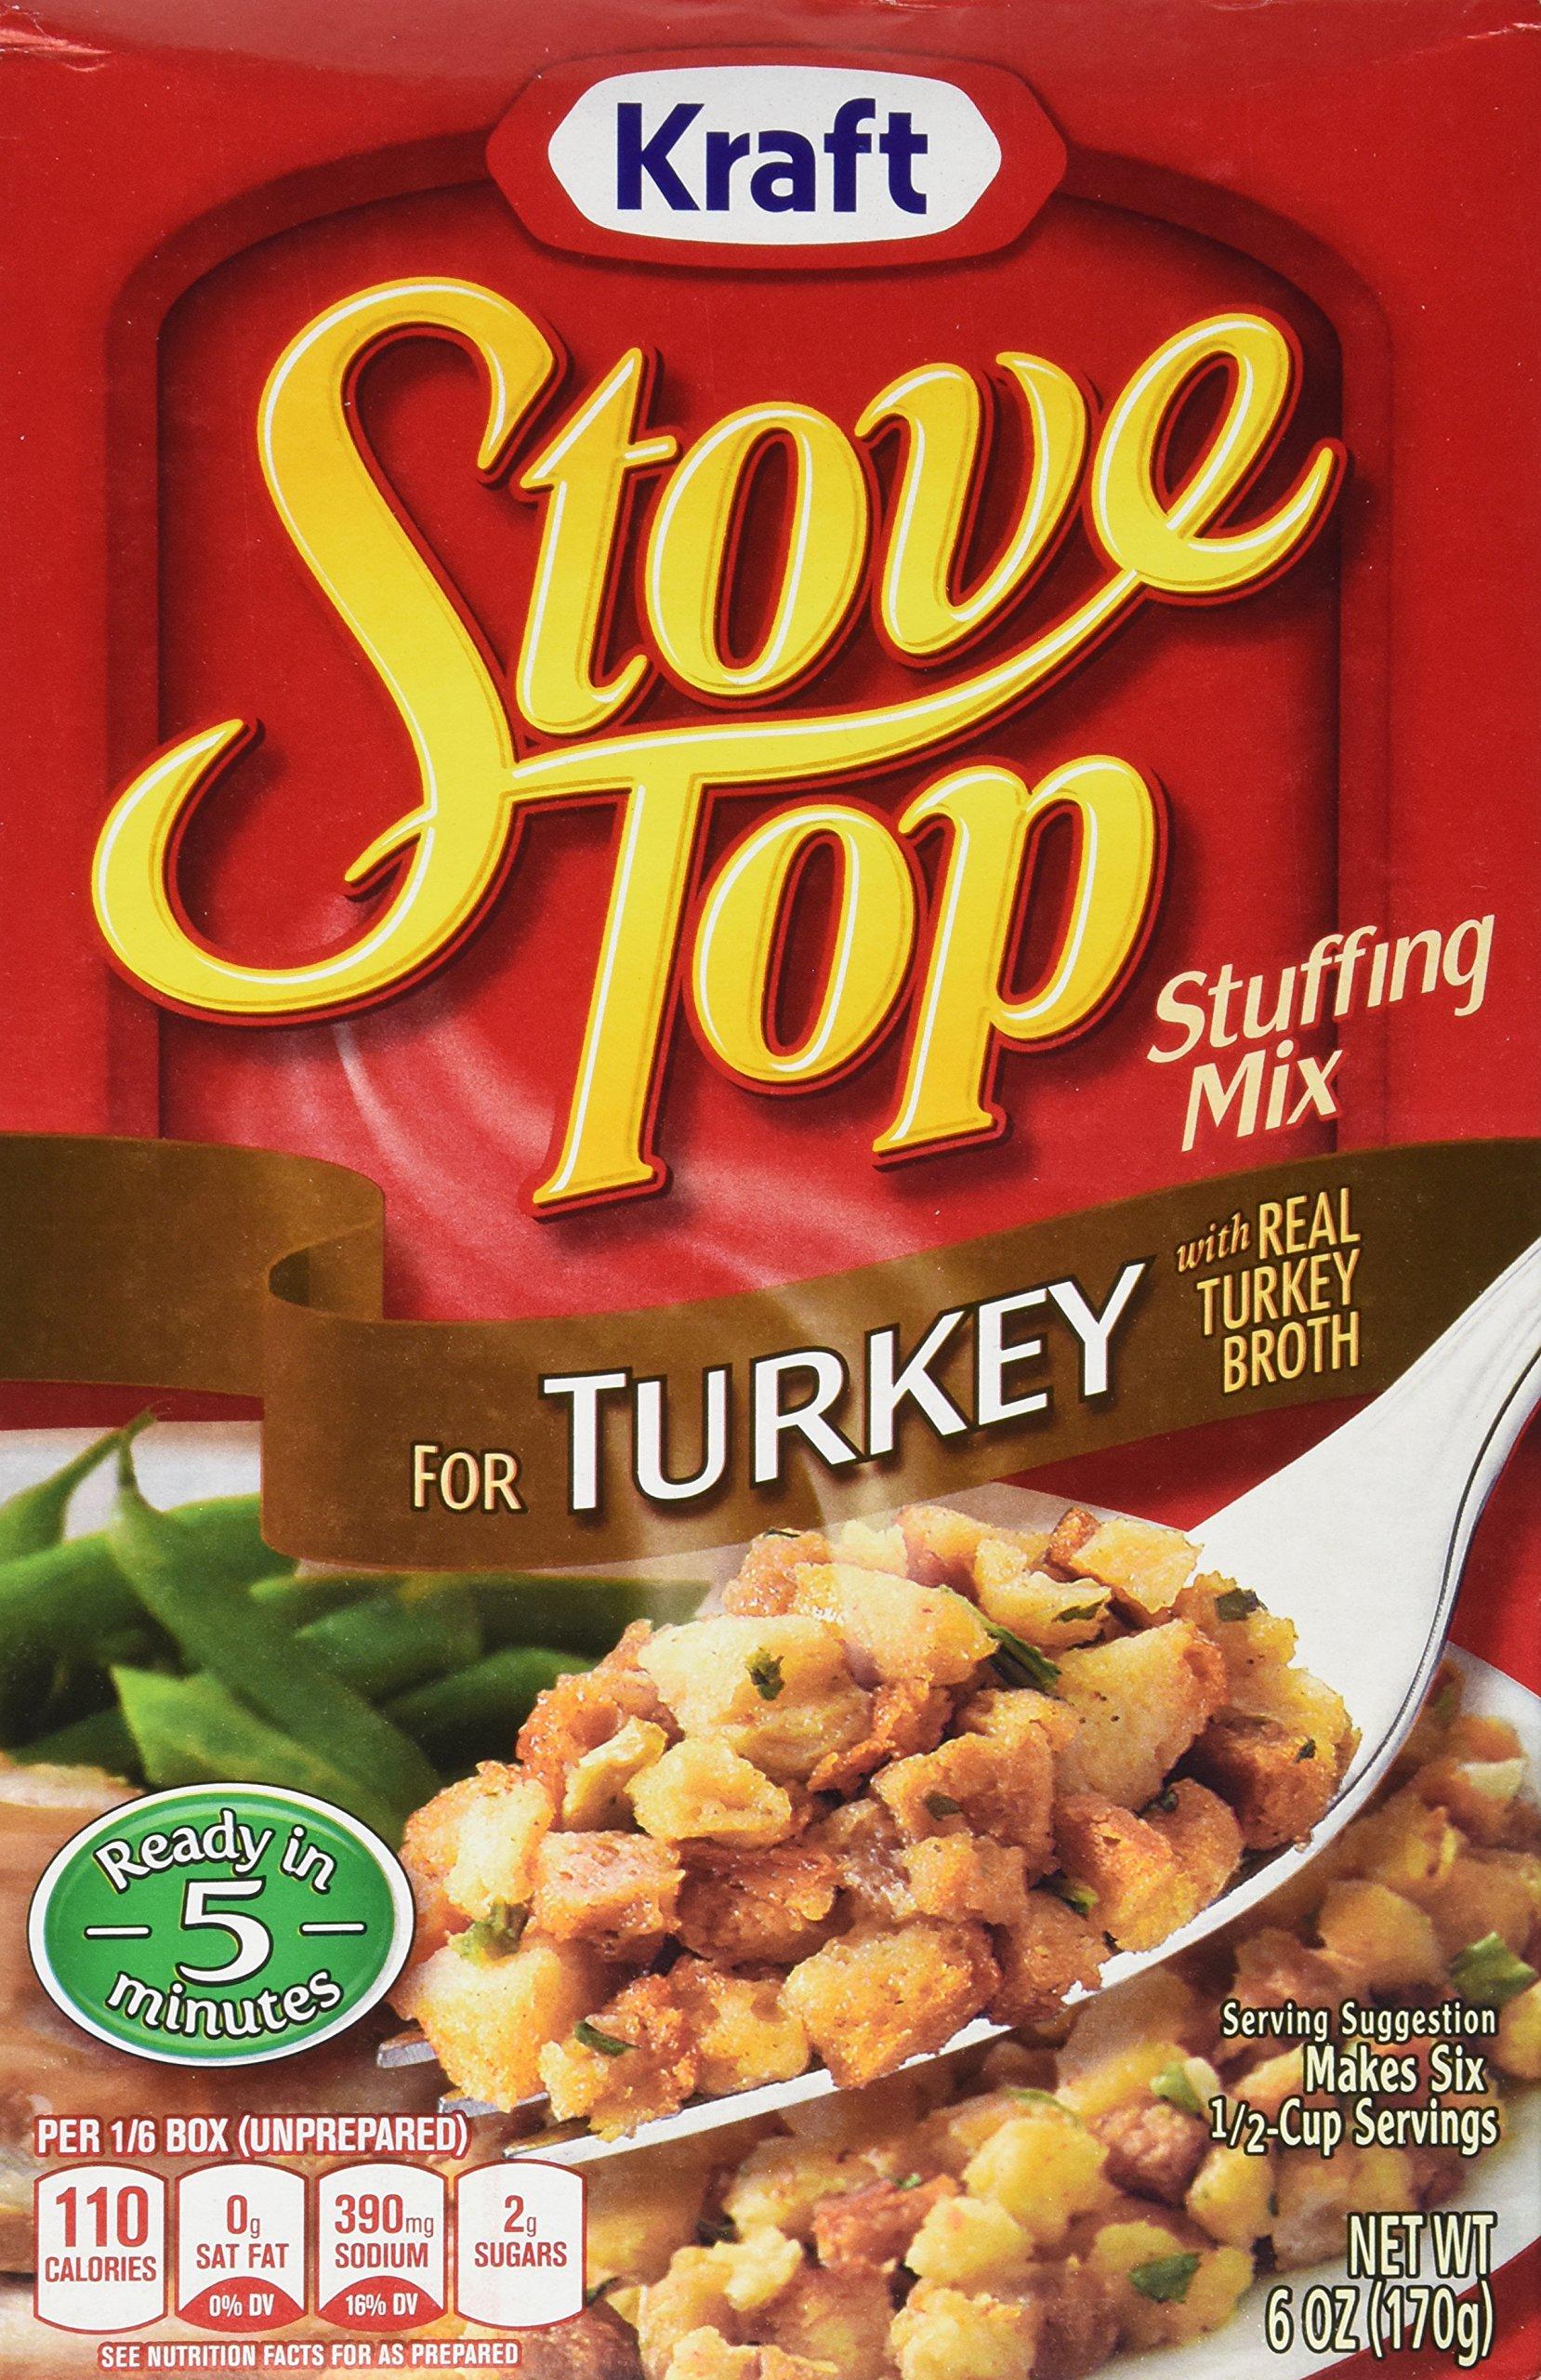 Kraft Stove Top Turkey Stuffing Mix (Pack of 3) 6 oz Boxes